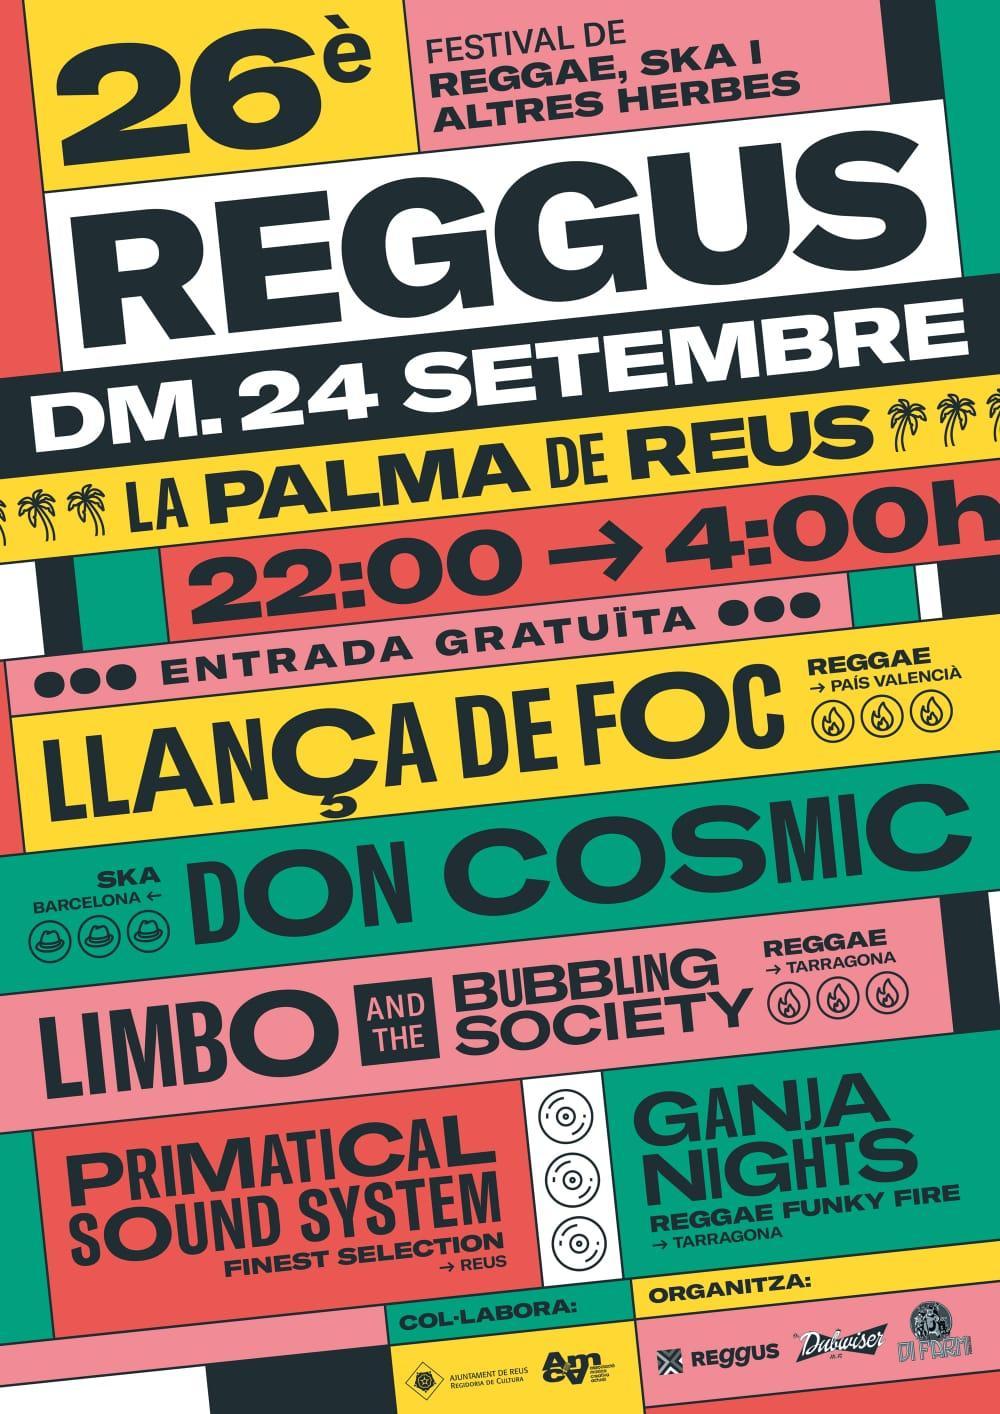 26è Reggus. Festival de